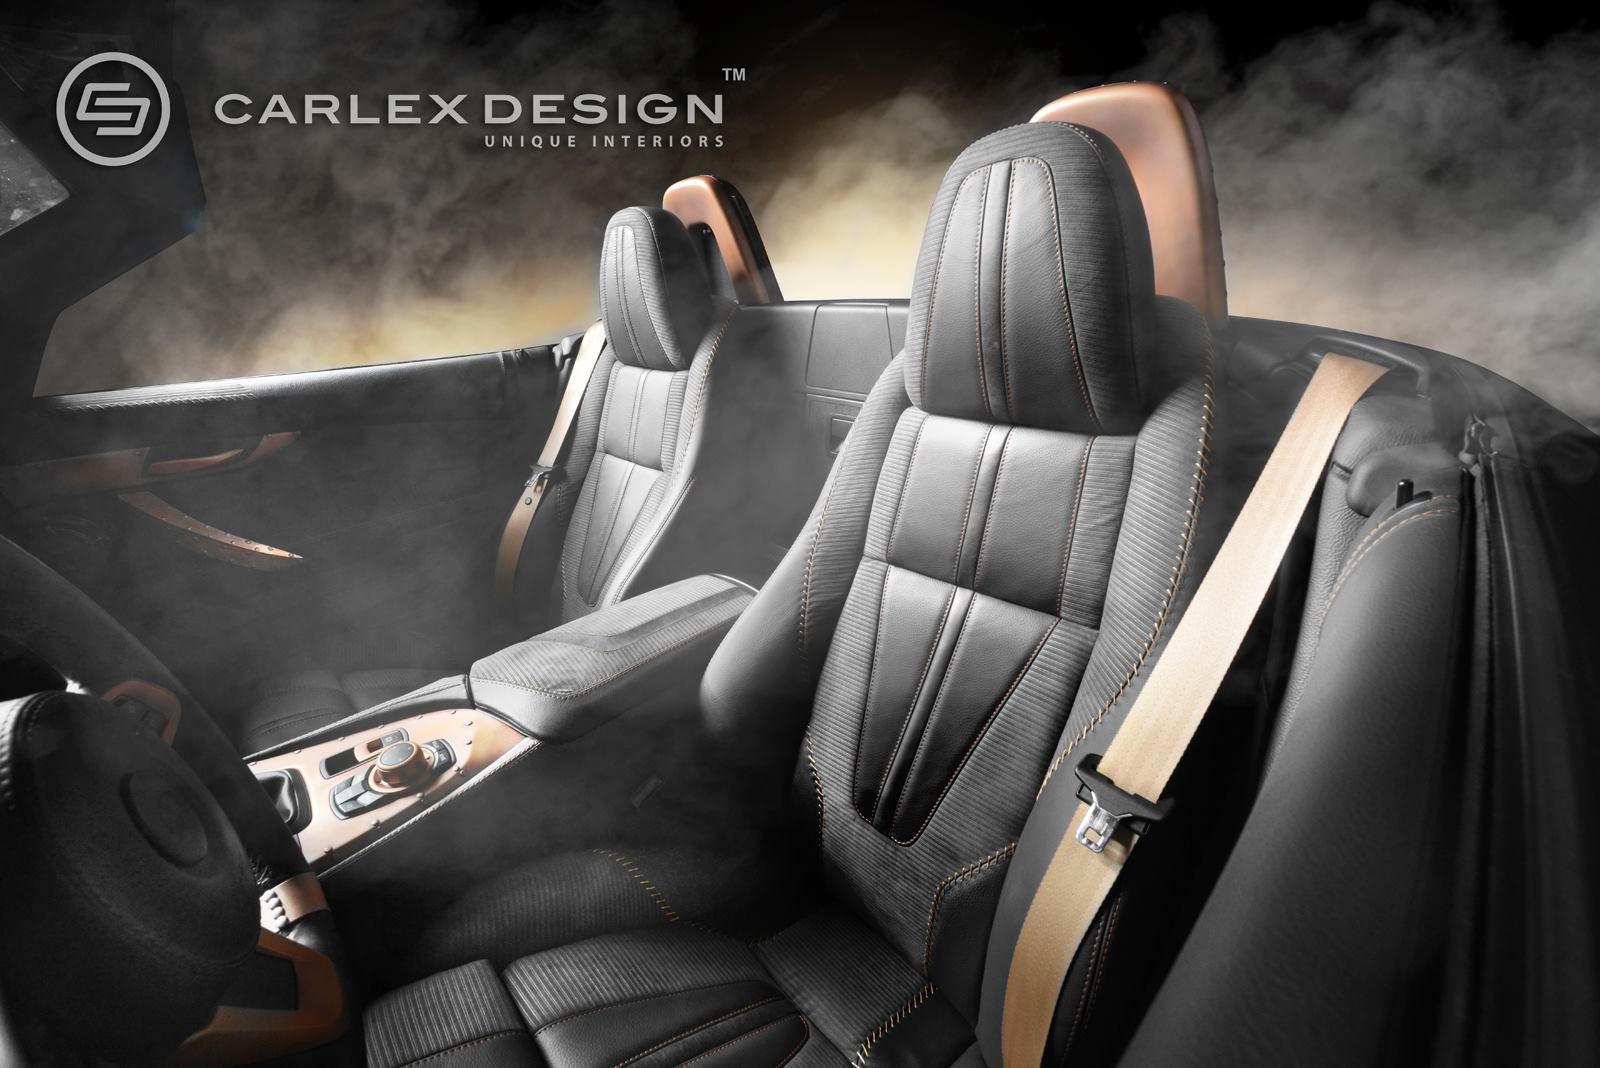 BMW Z4 by Carlex Design - BMW Z4 by Carlex Design